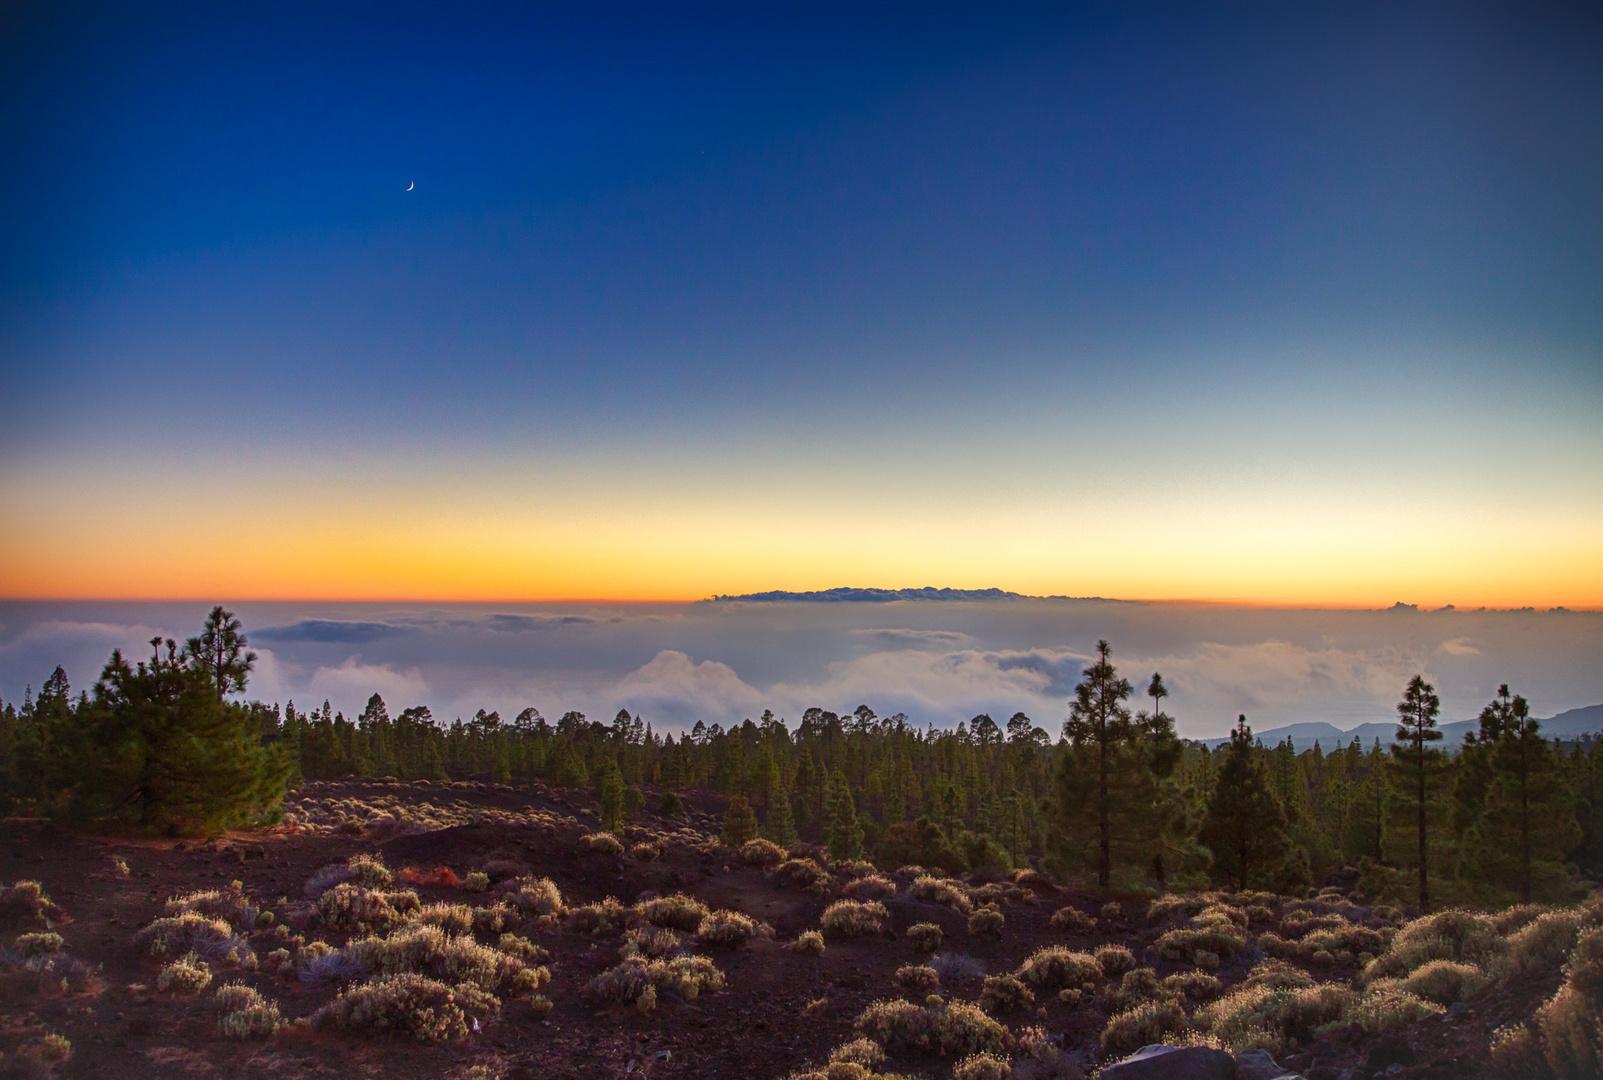 Sonnenuntergang a, Teide